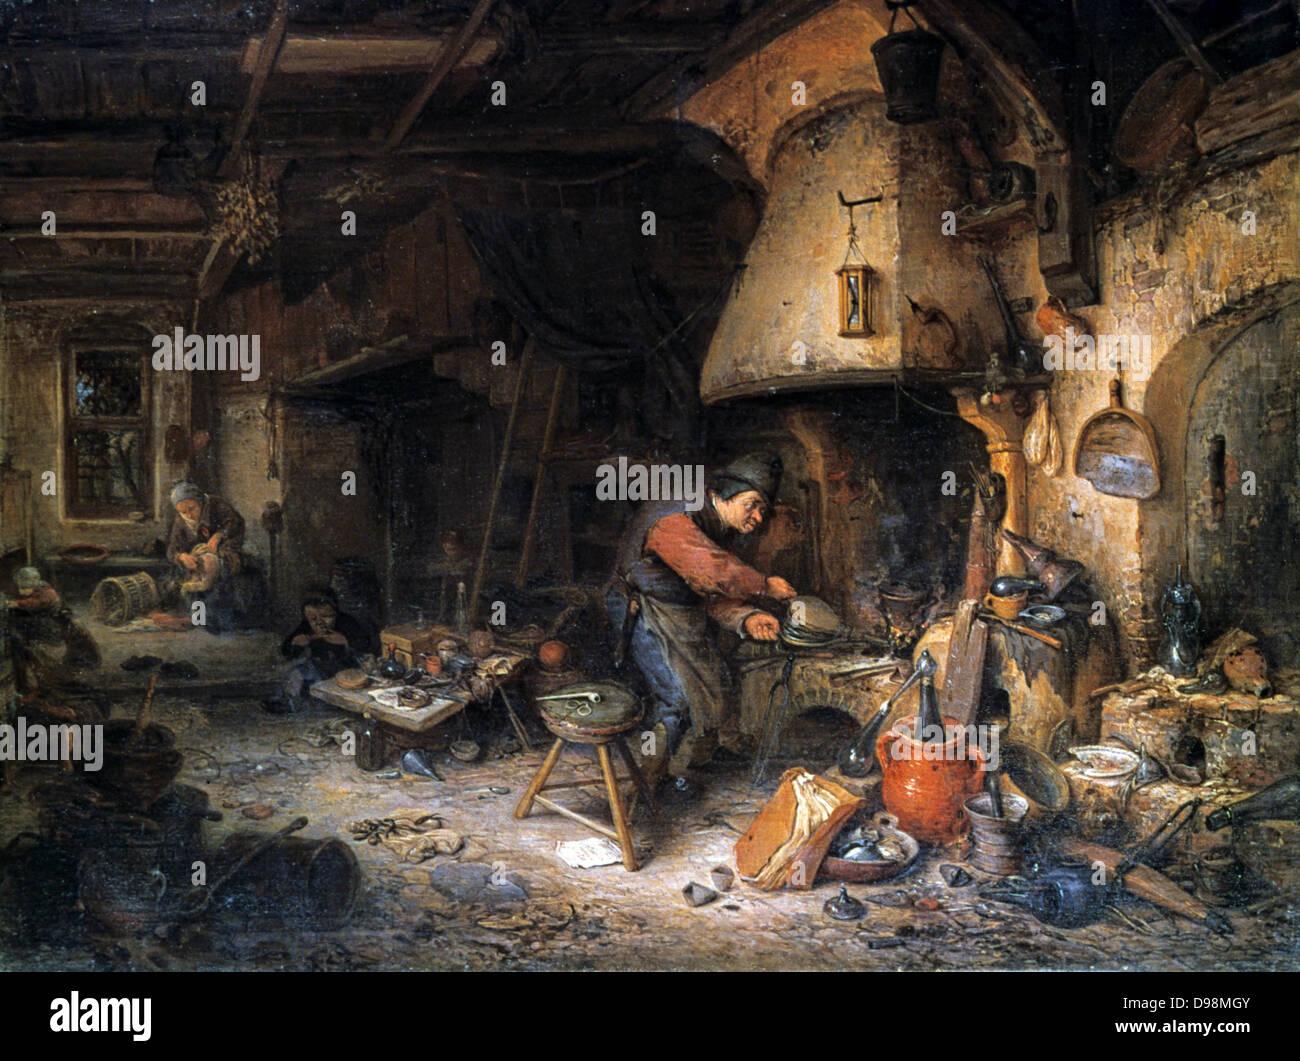 The Alchemist' 1661. Oil on panel. Adriaen van Ostade (1610-1685) Dutch genre painter. Alchemist applying bellows - Stock Image